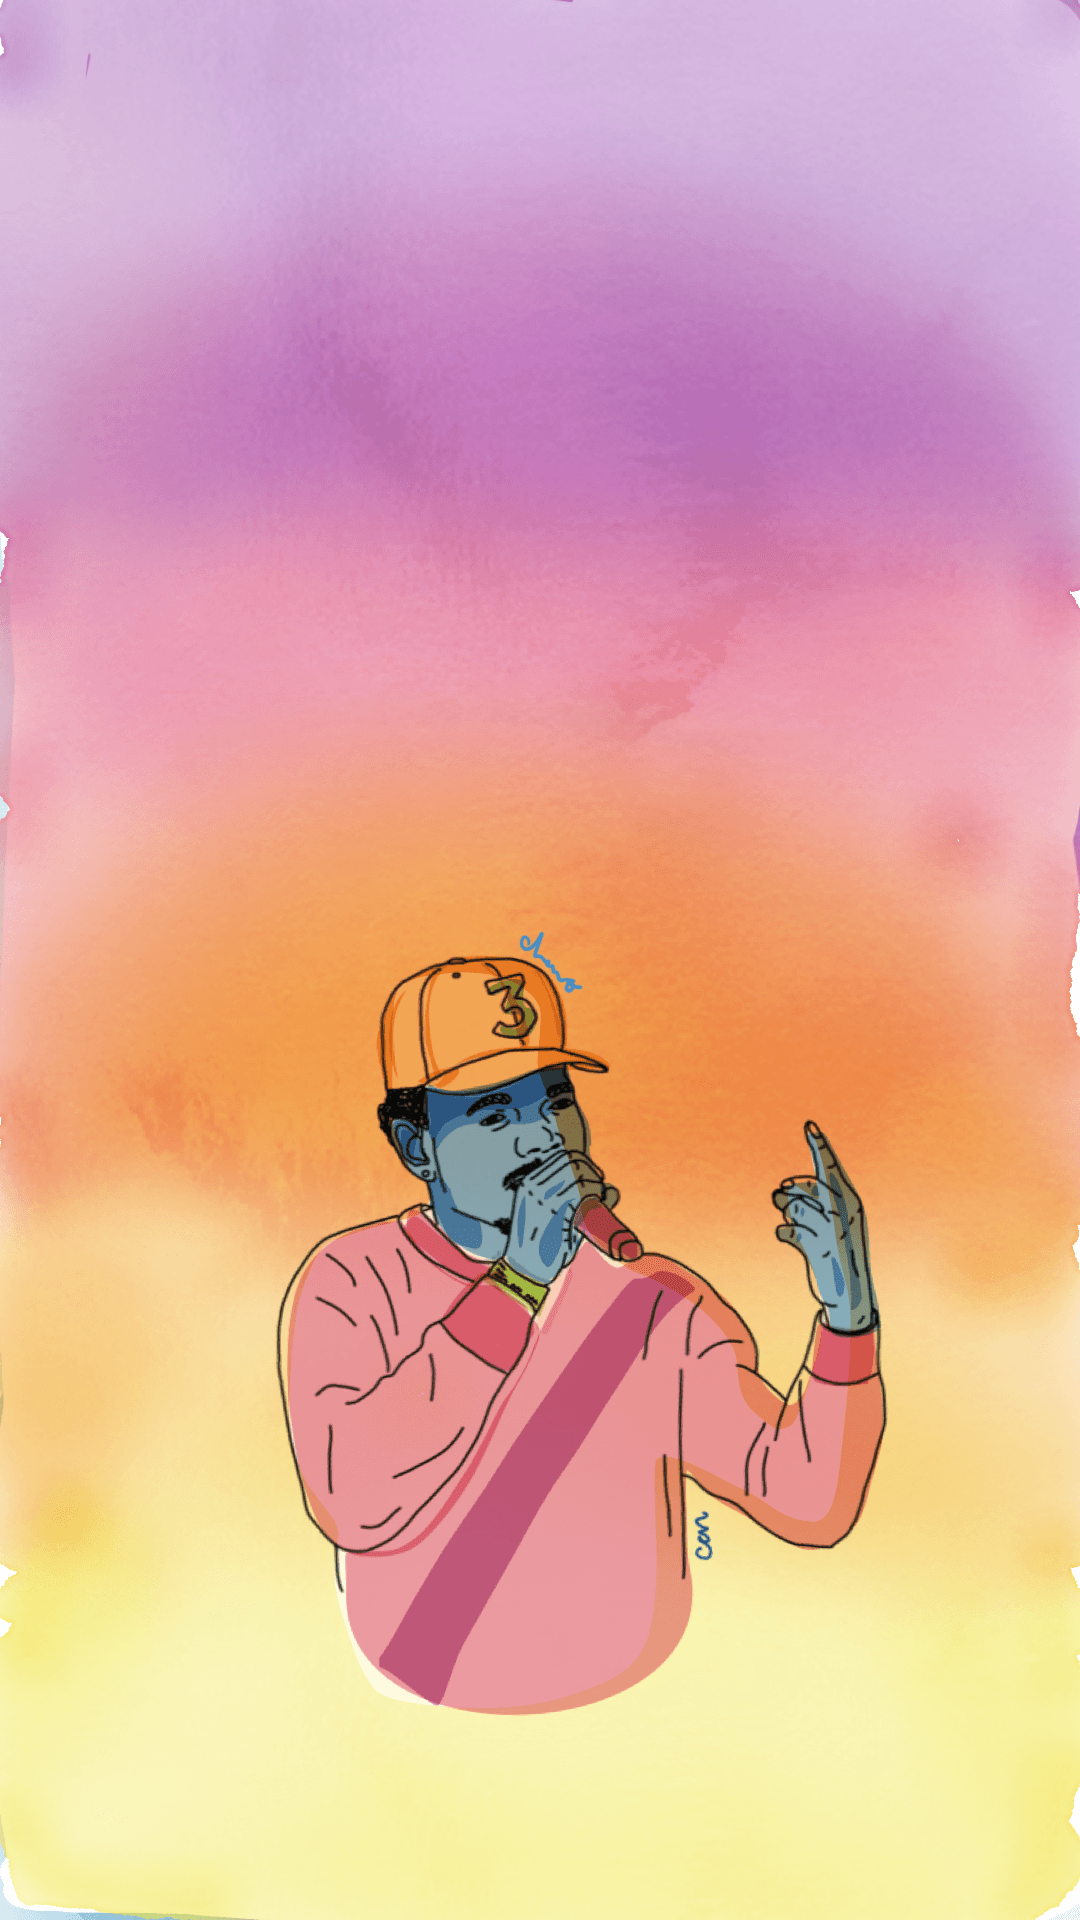 35 Best Free Cartoon Rapper Wallpapers - WallpaperAccess